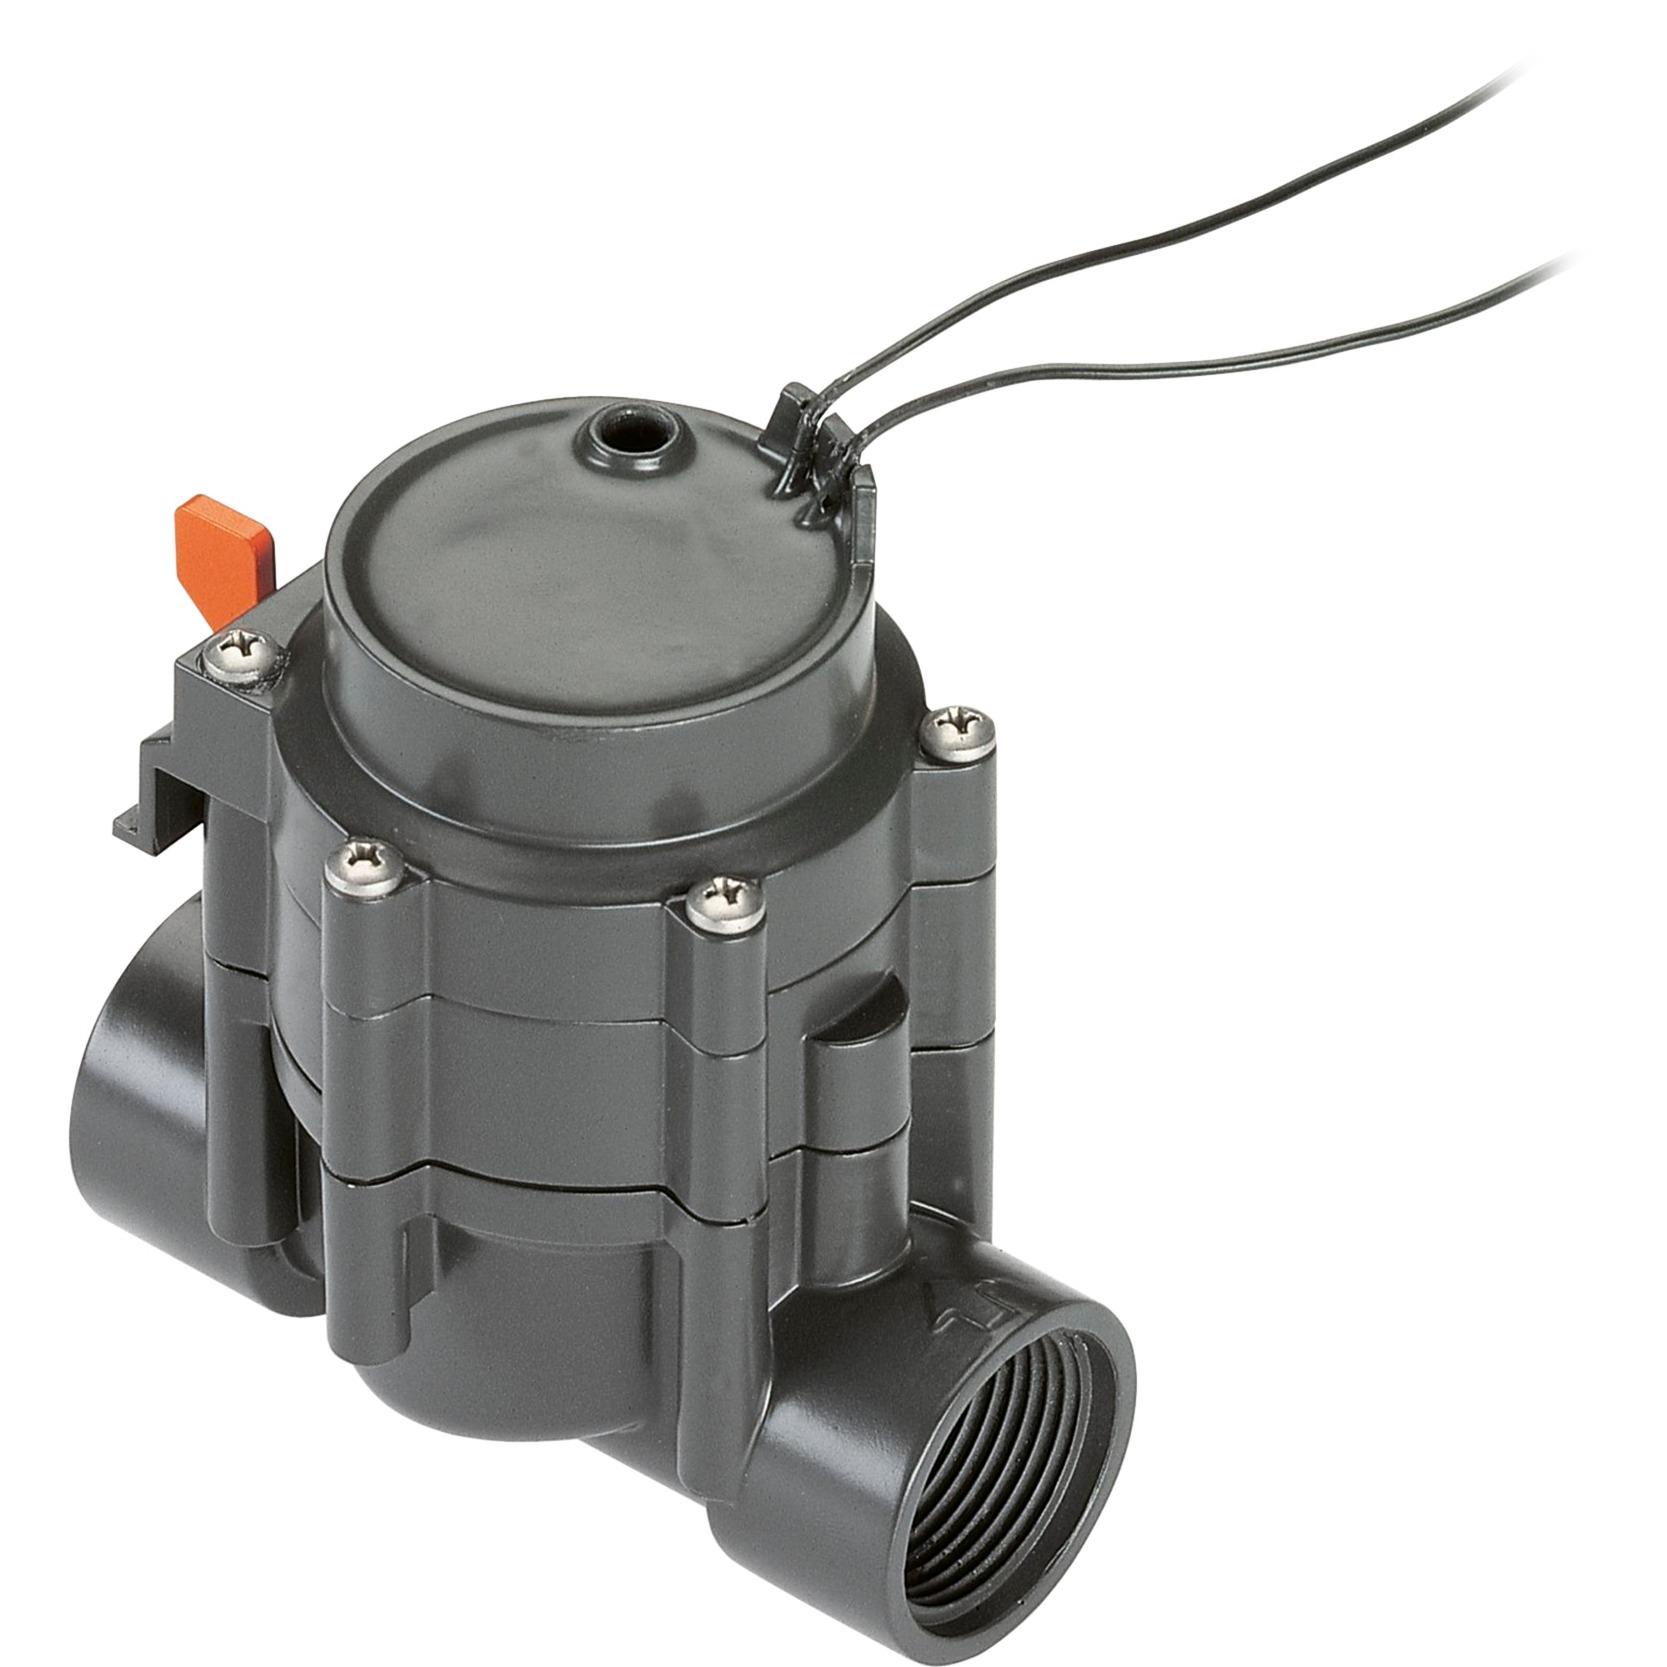 bewaesserungsventil-1-24v-1278-20-elektronisk-kunstvanding